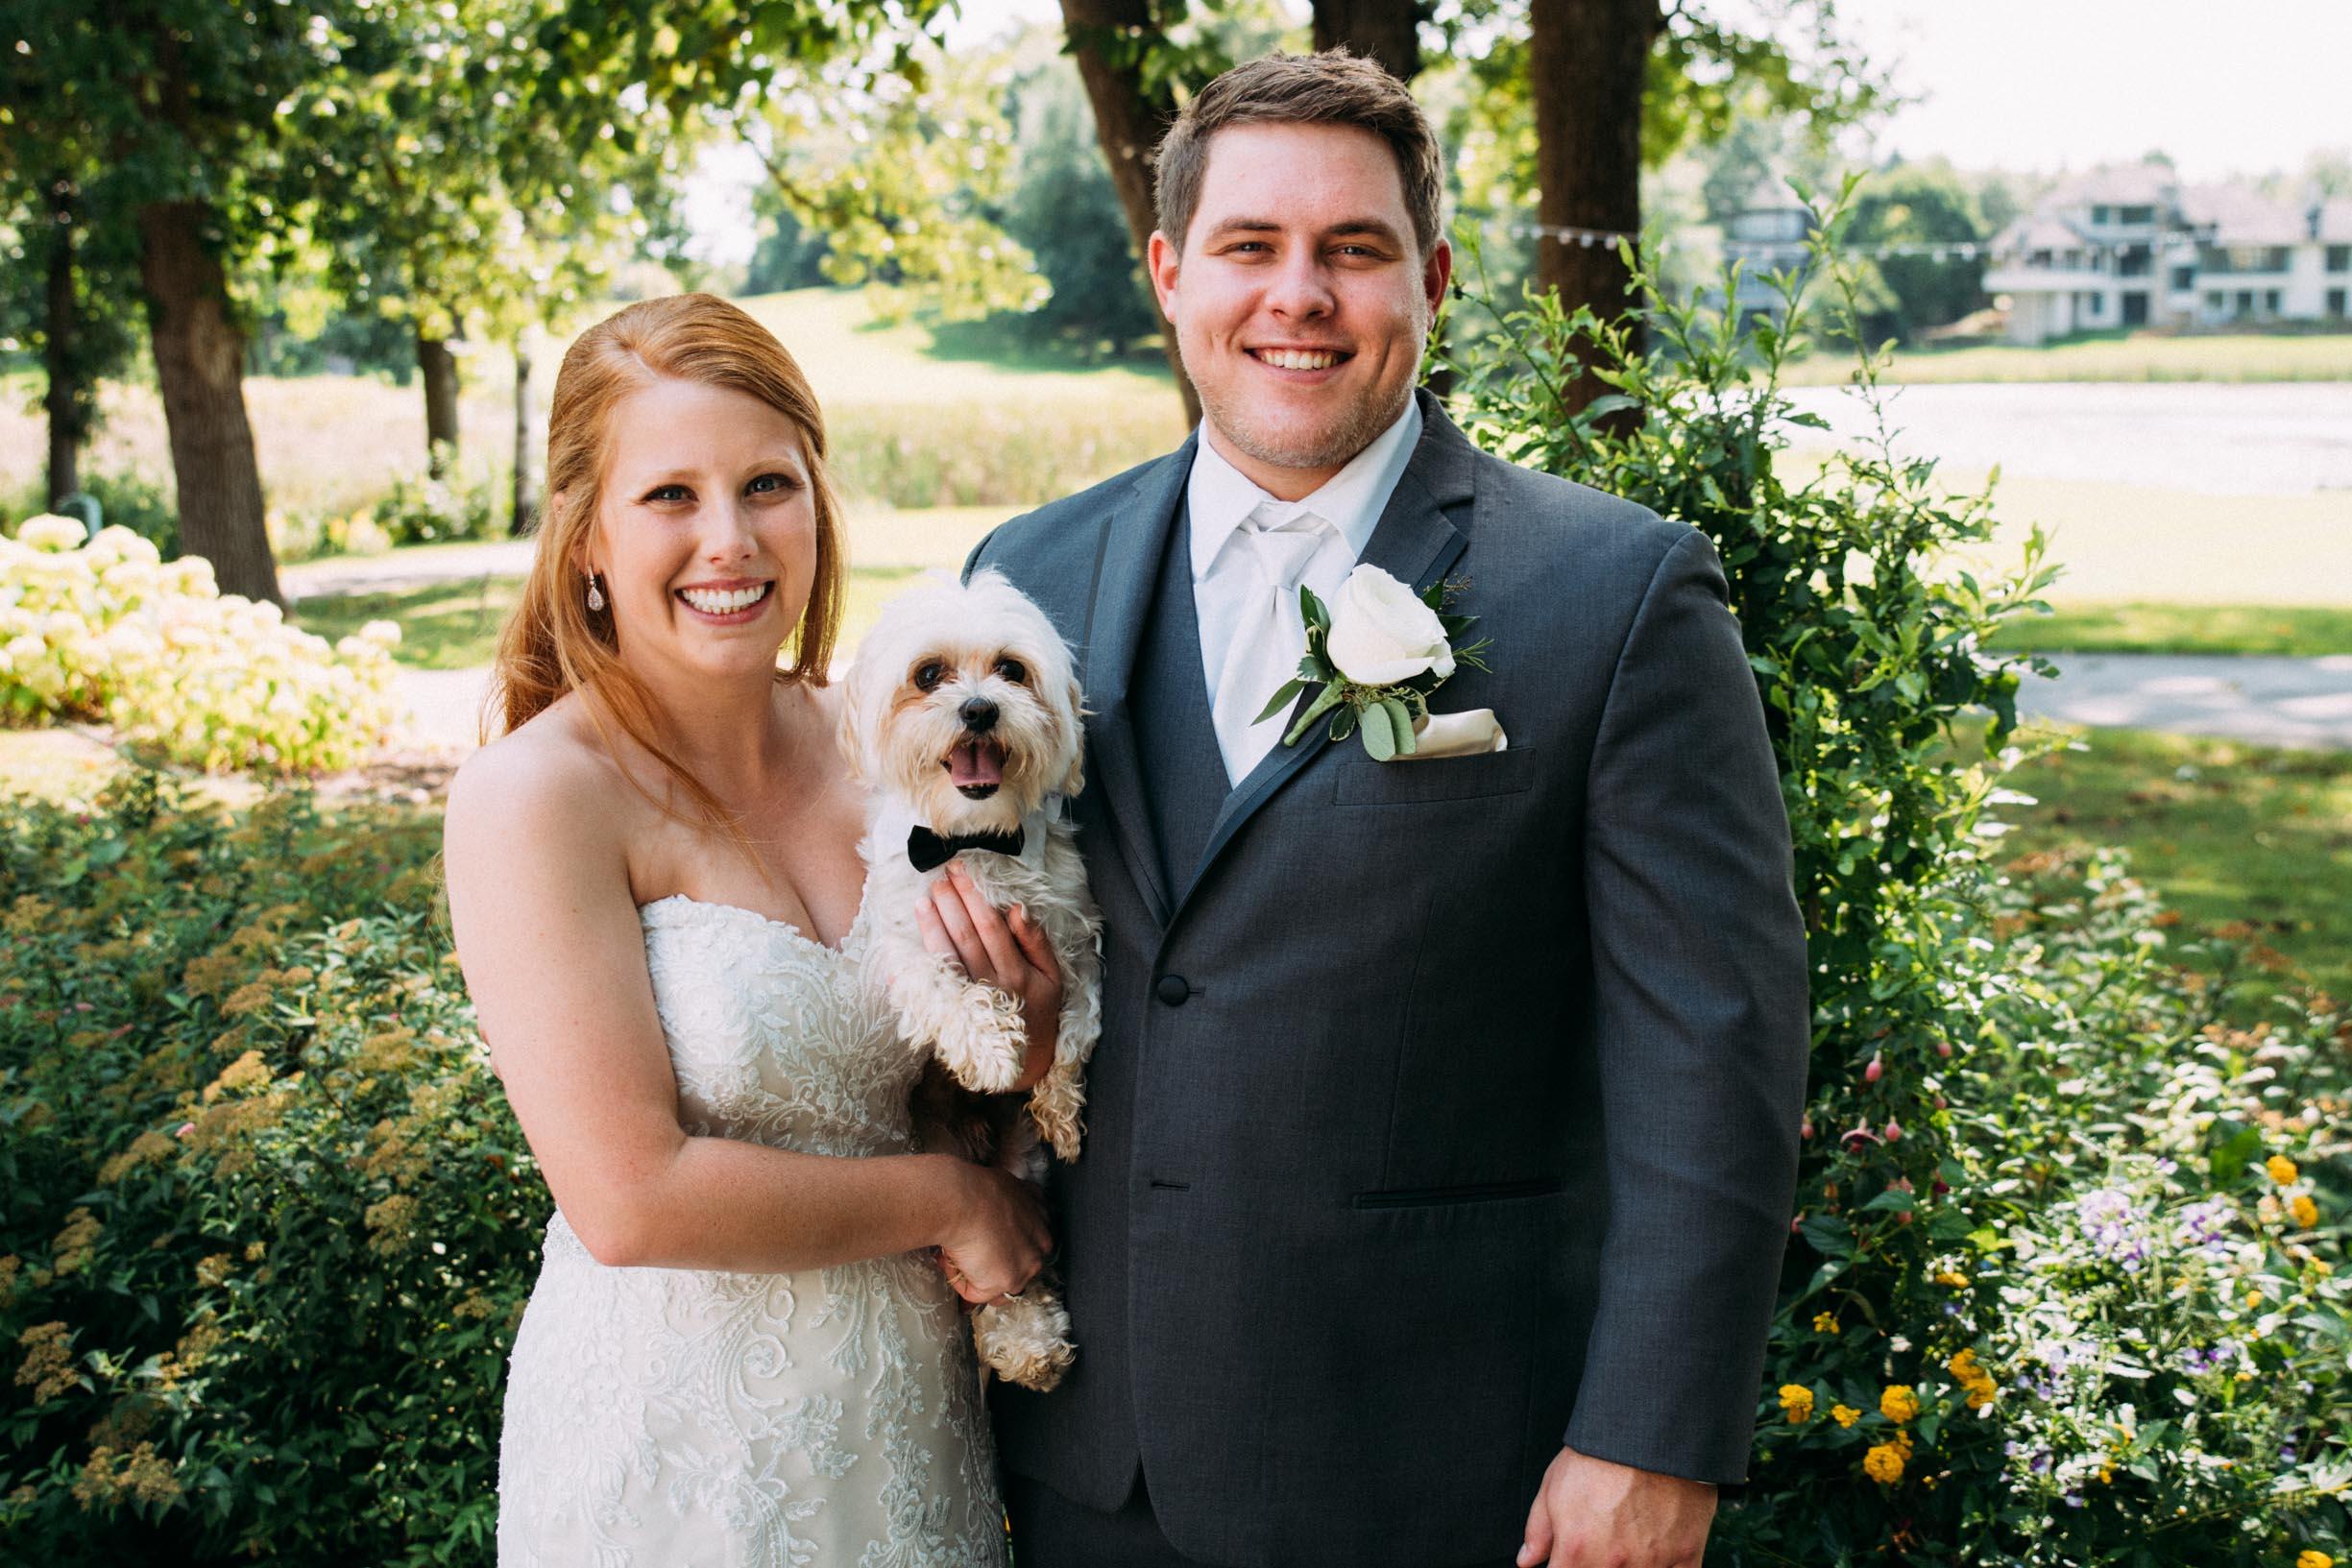 Megan_Zach_Minneapolis_Wedding_Ceremony_Blog-30.jpg